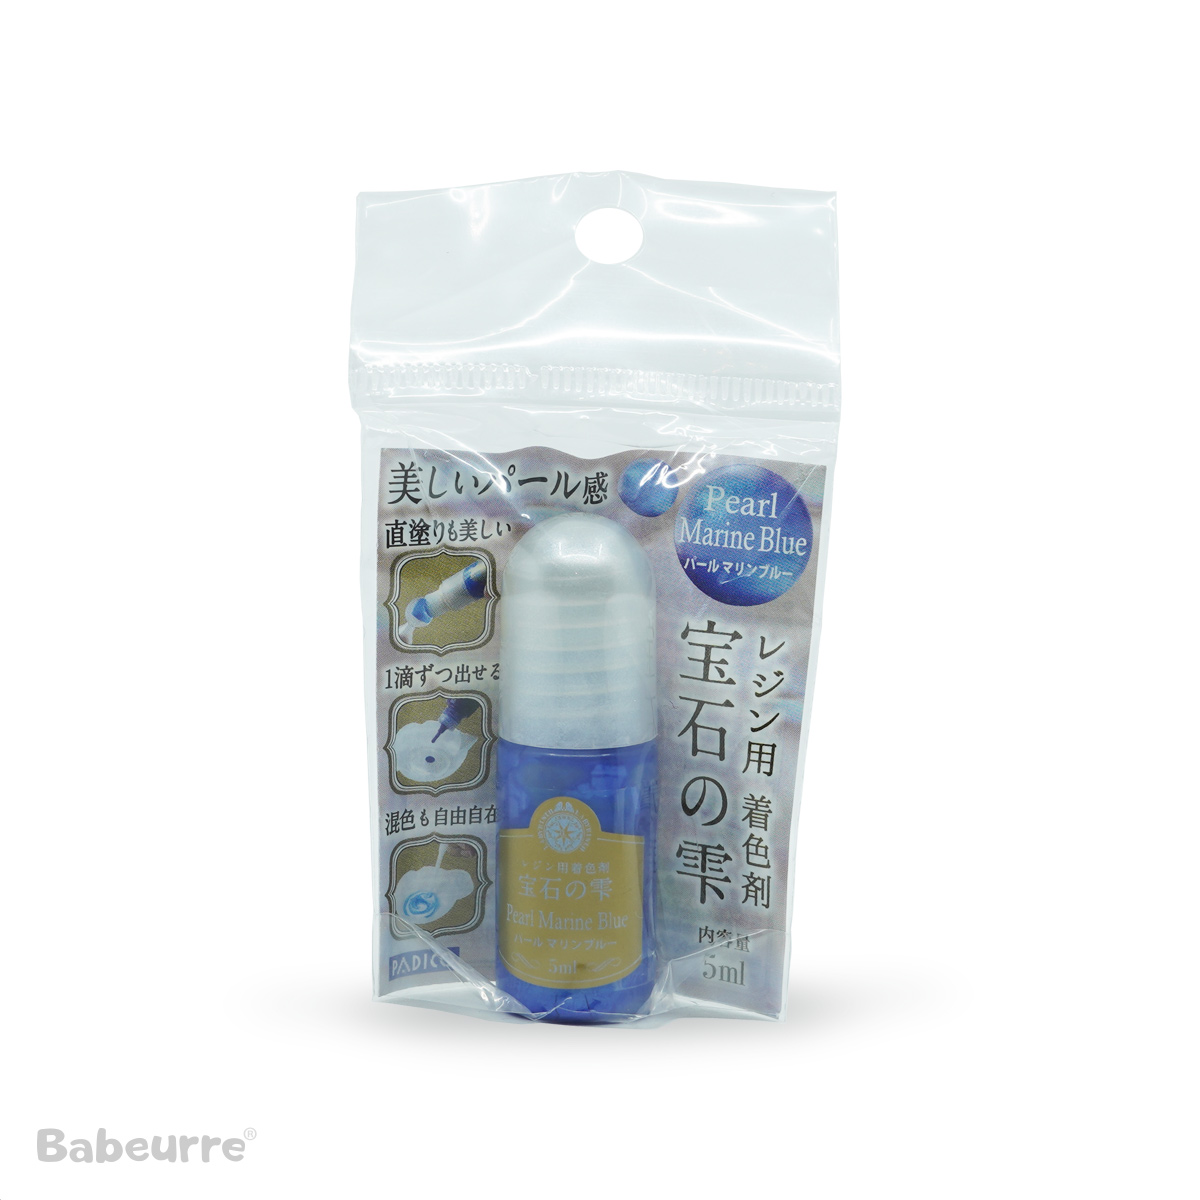 Padico pigment pearl marine blue